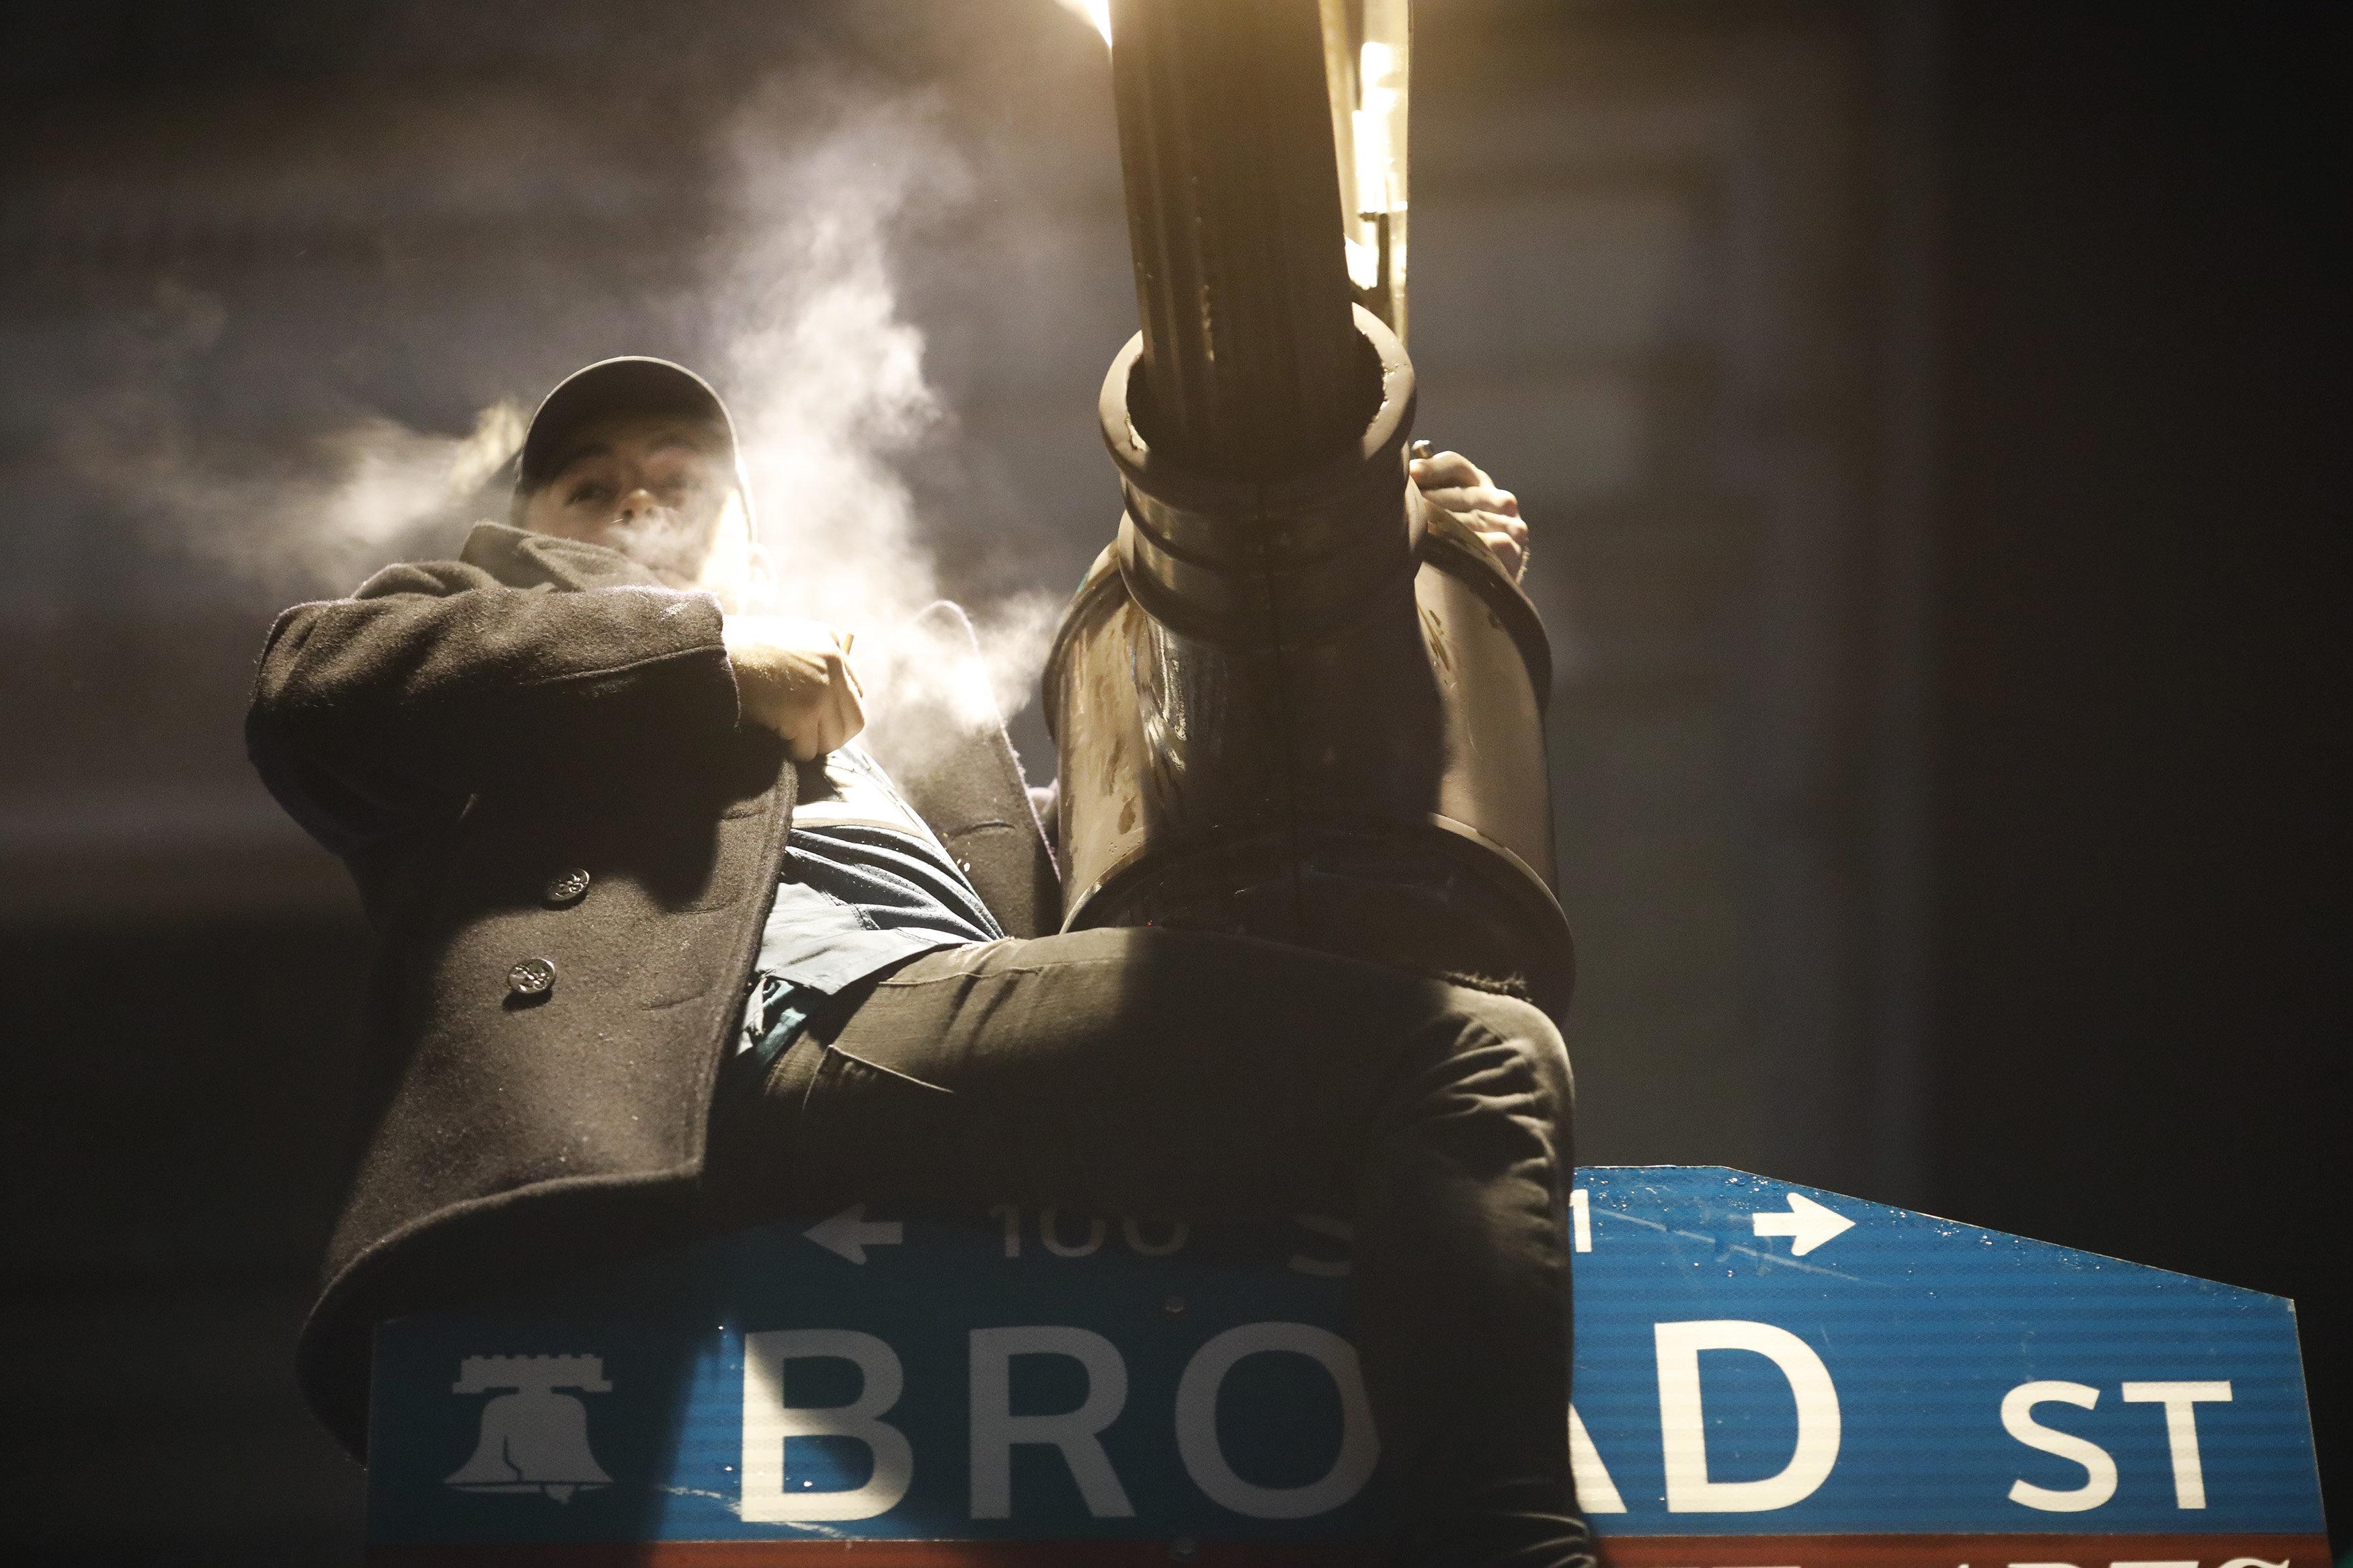 Philly Fans Scale Buildings, Climb Poles, Set Fires After Super Bowl